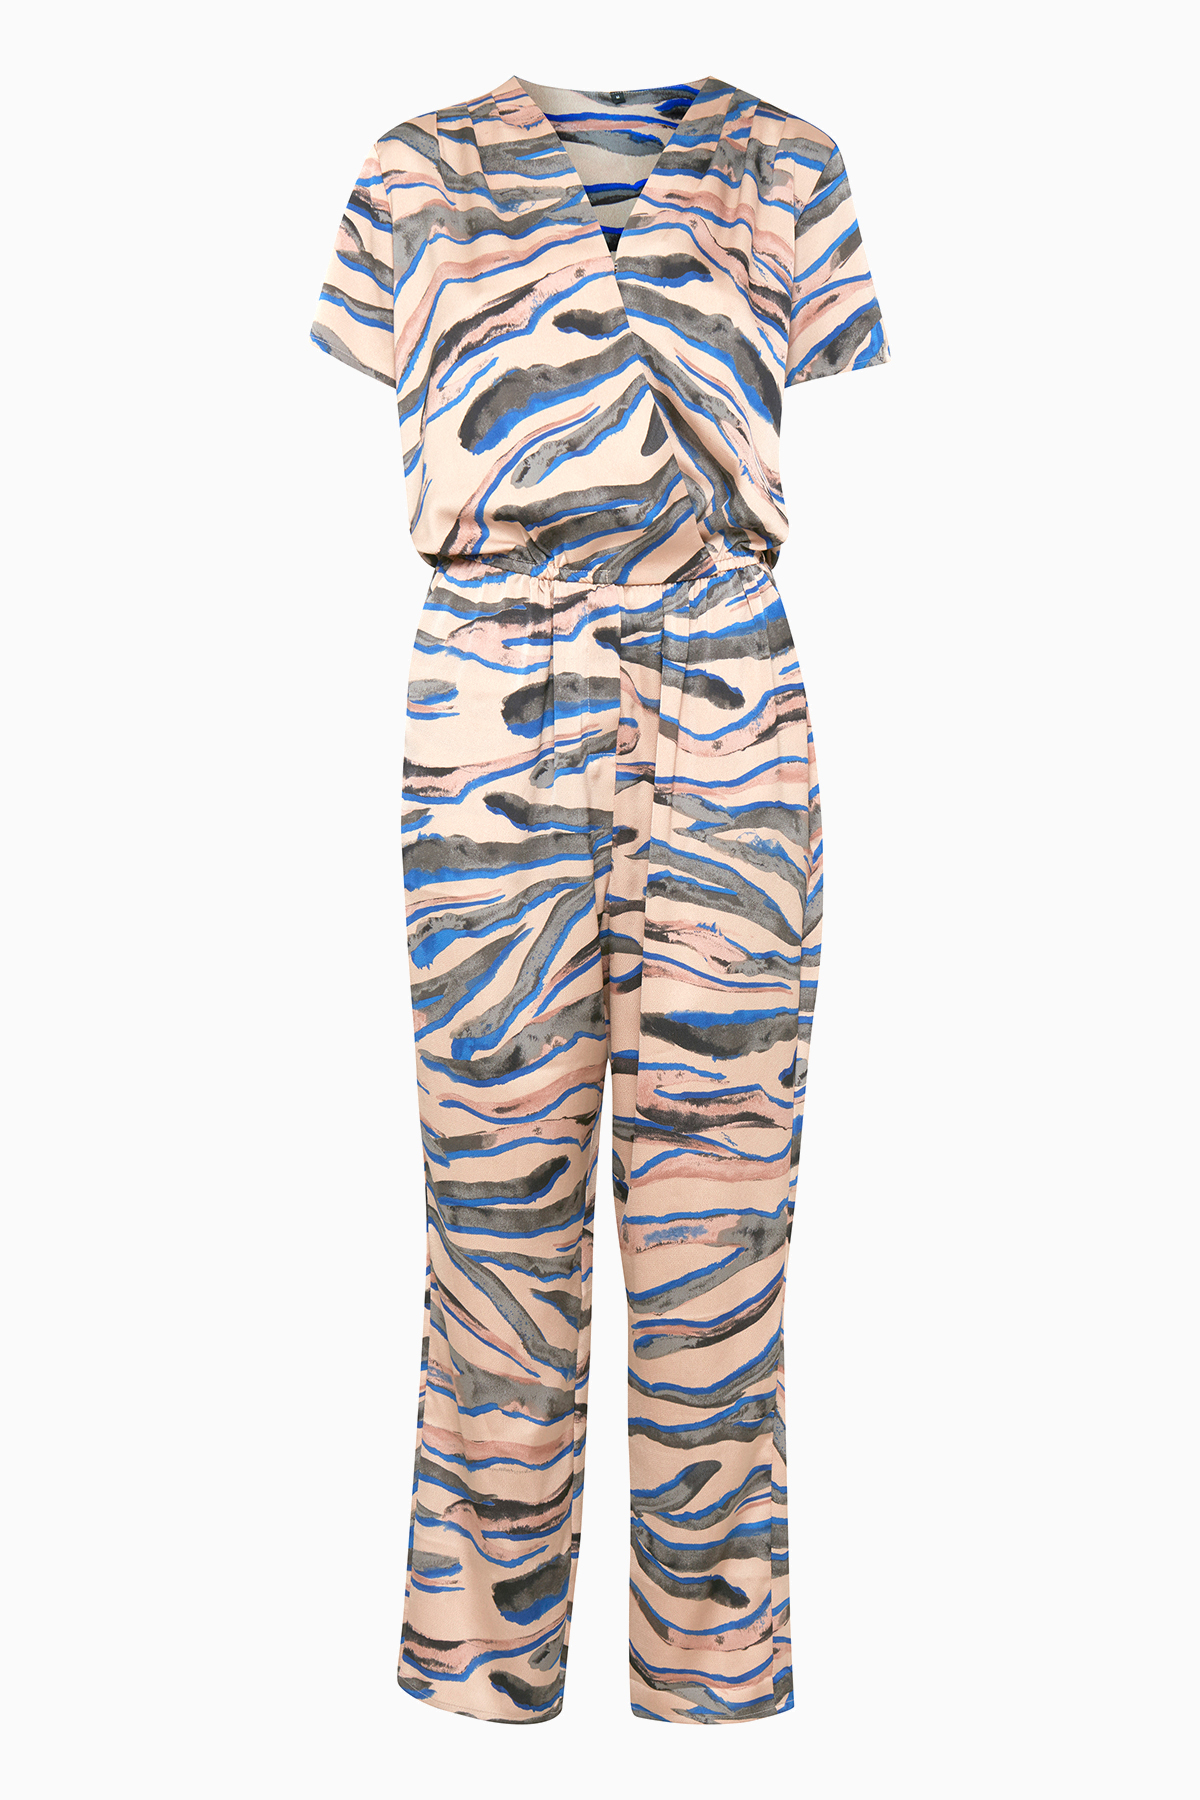 Pulz Jeans Dame Smuk Irena jumpsuit - Tan